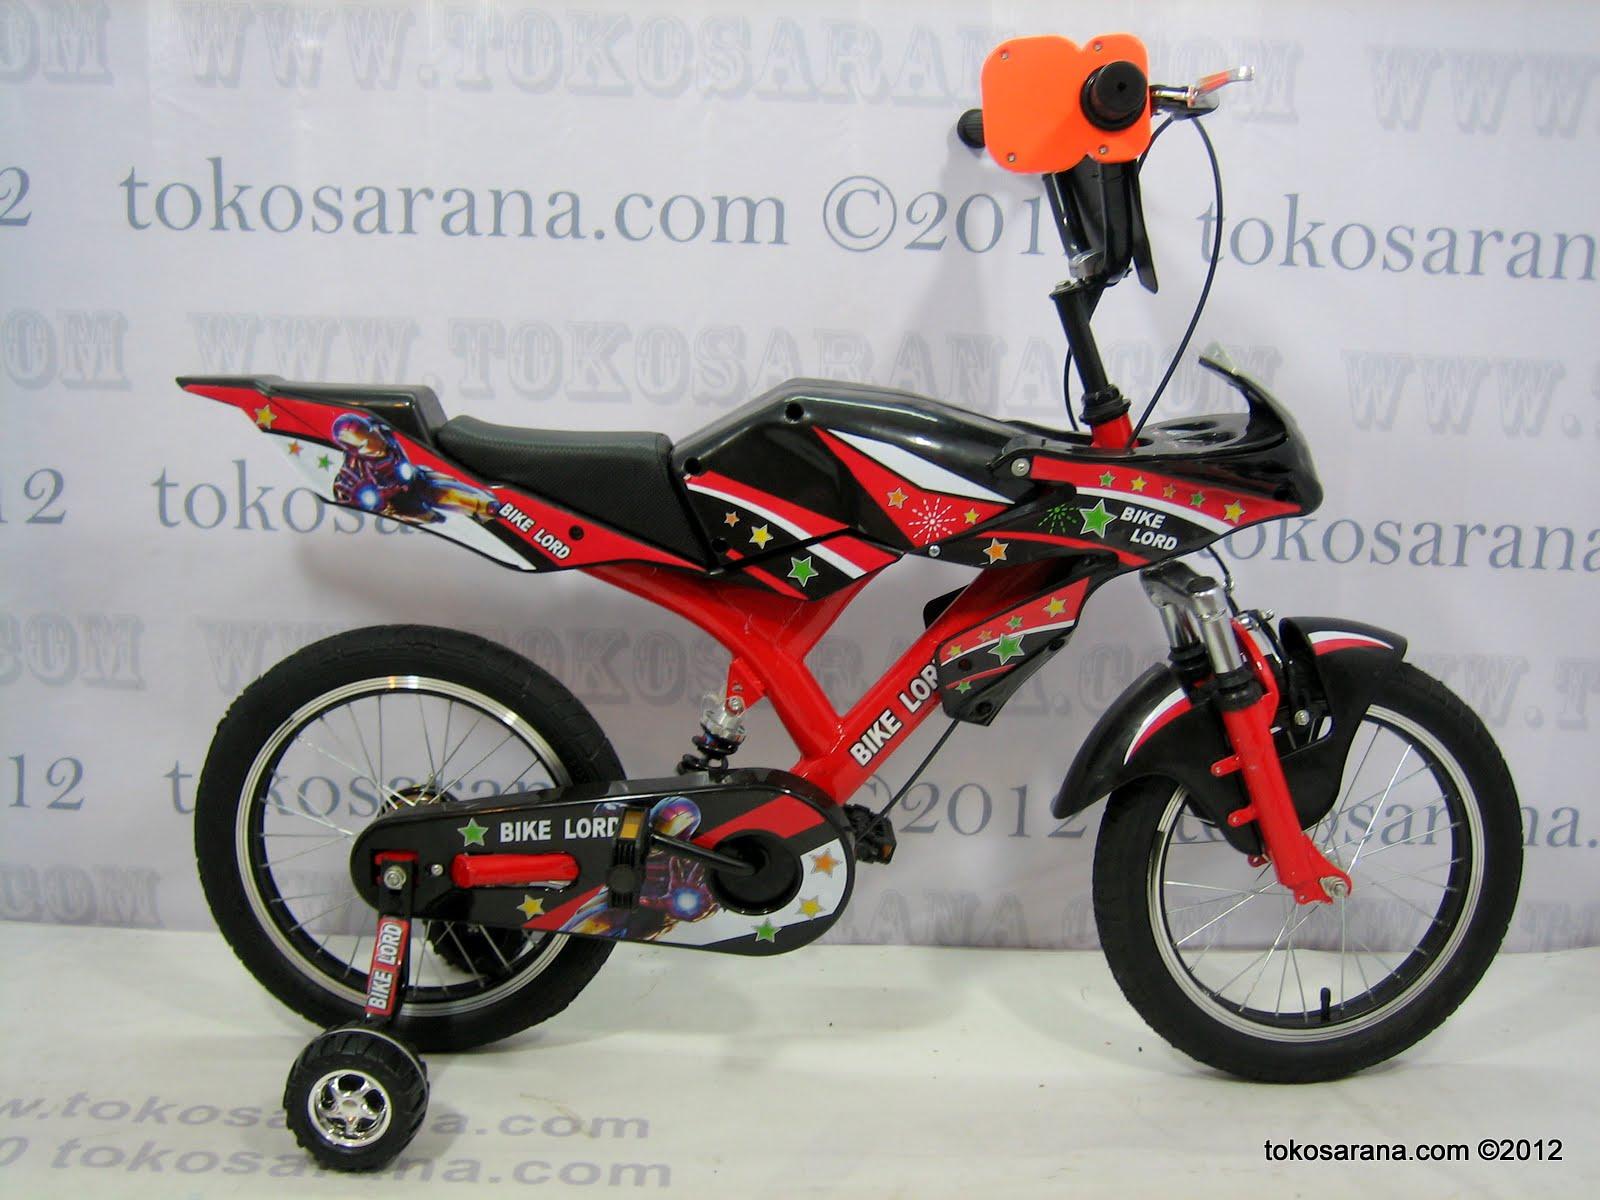 TokosaranaTMJakarta Jatinegara Sepeda Anak Bike Lord